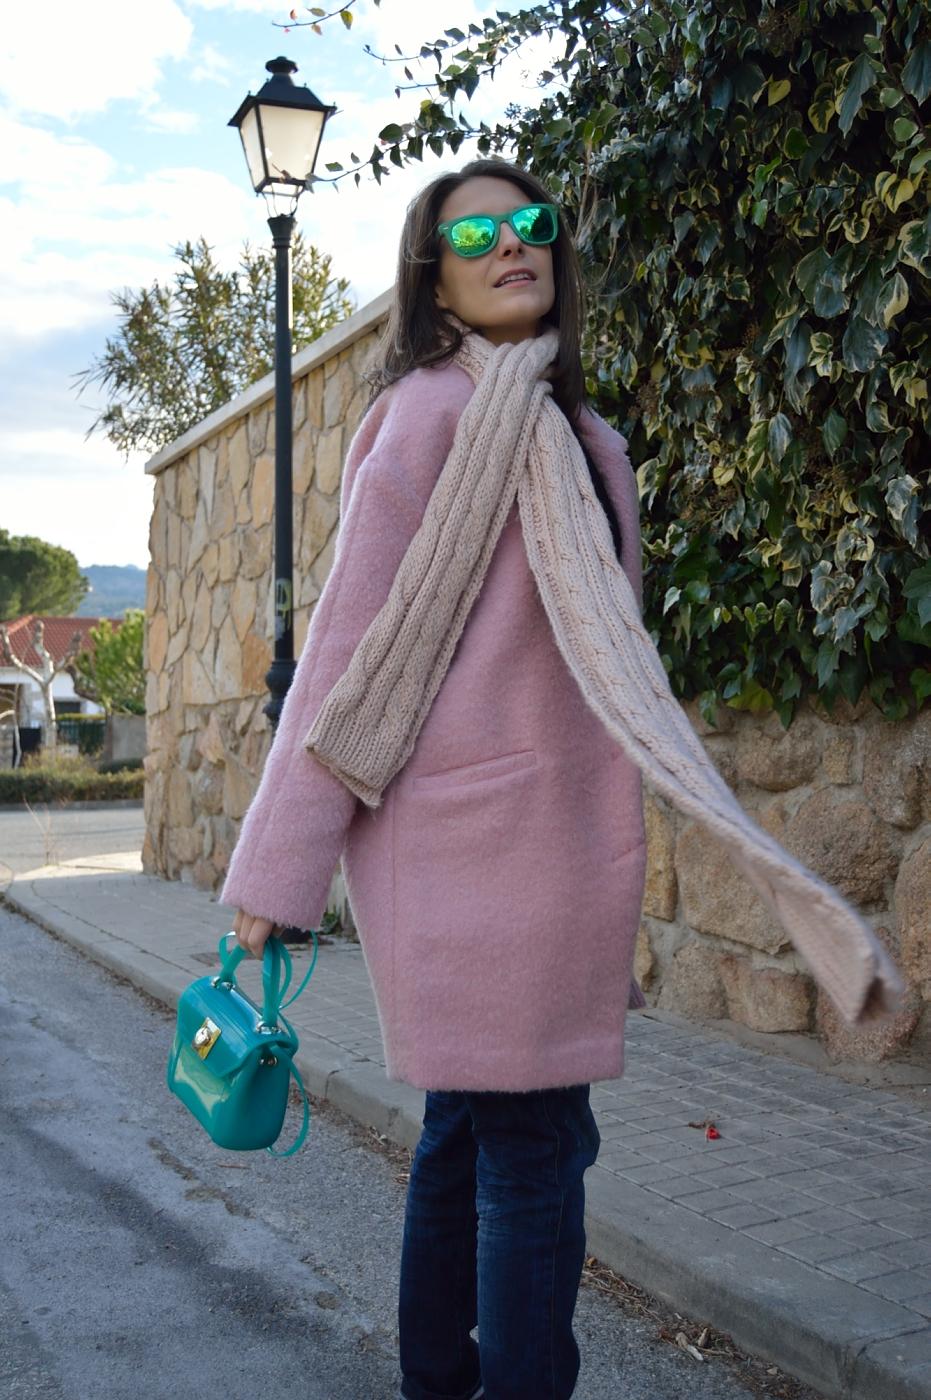 lara-vazquez-mad-lula-style-cute-cotton-candy